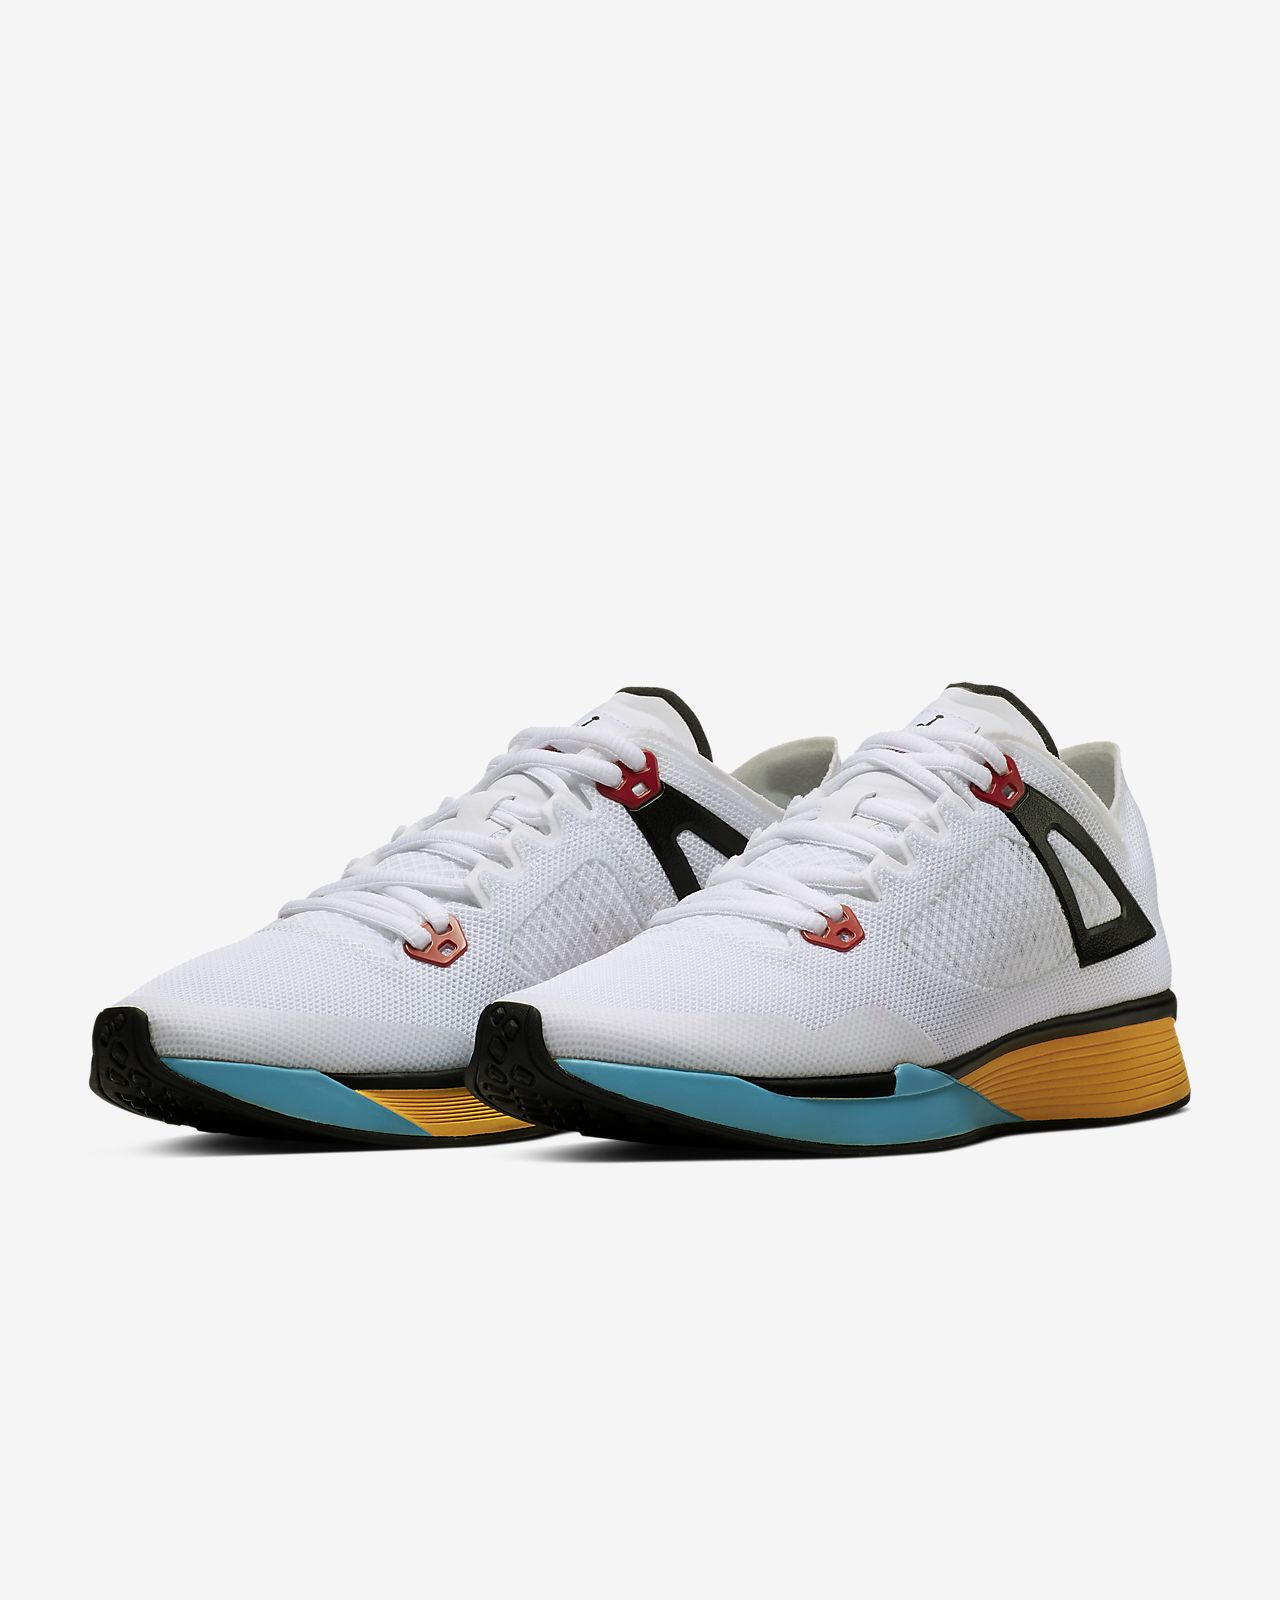 san francisco c04a9 578a0 Jordan 89 Racer Men's Training Shoe